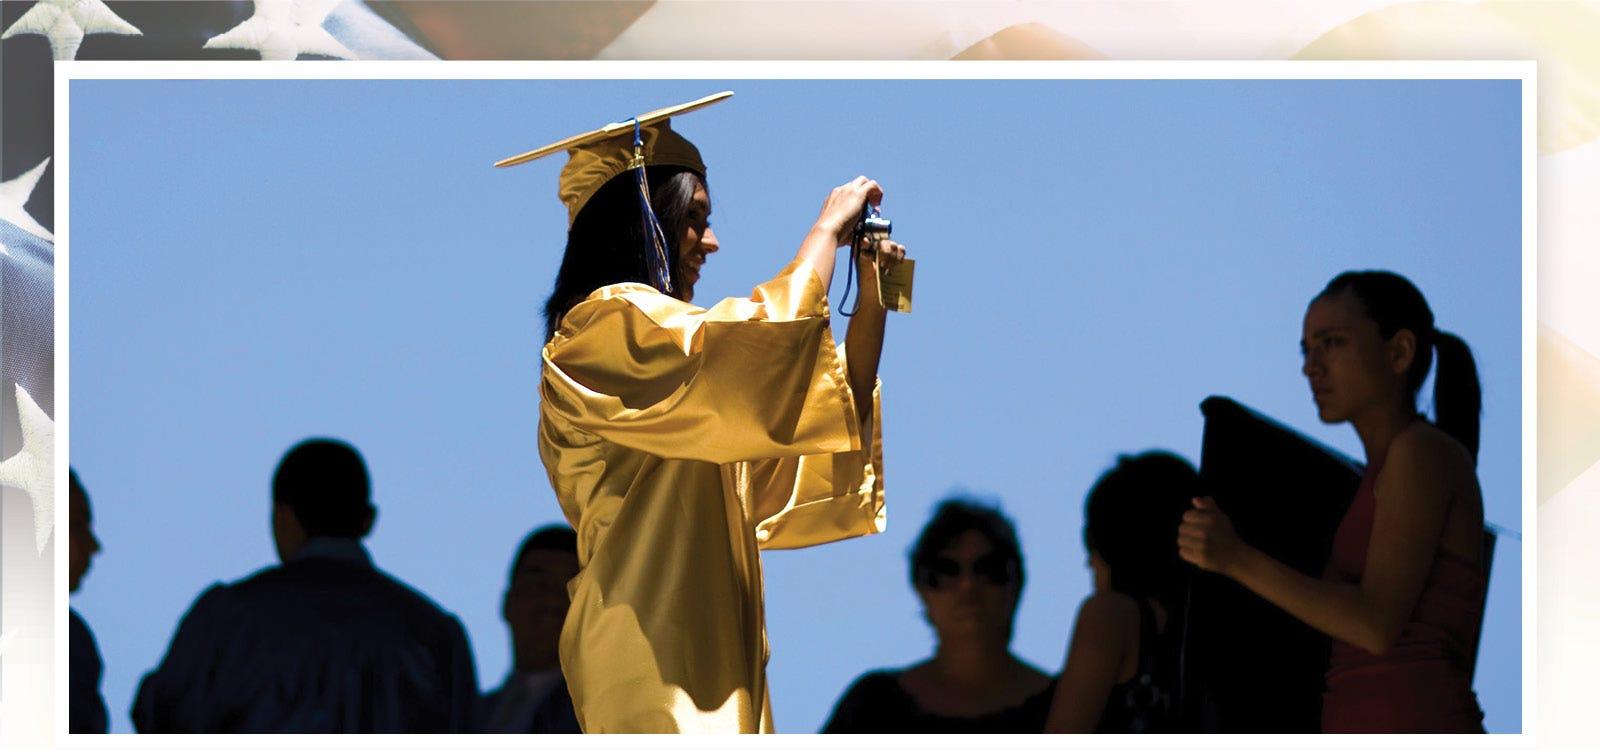 Alejandra Valenzuela 17,  takes photographs of her friends during her graduation from Carl Hayden Community High School in Arizona.